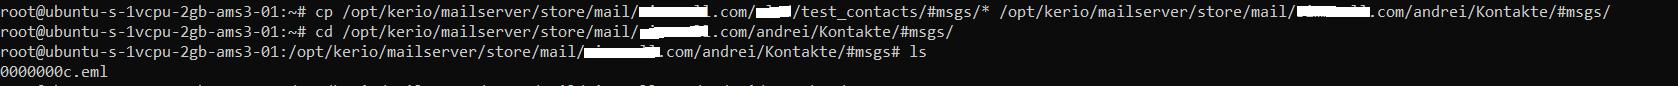 contacts_copy.png